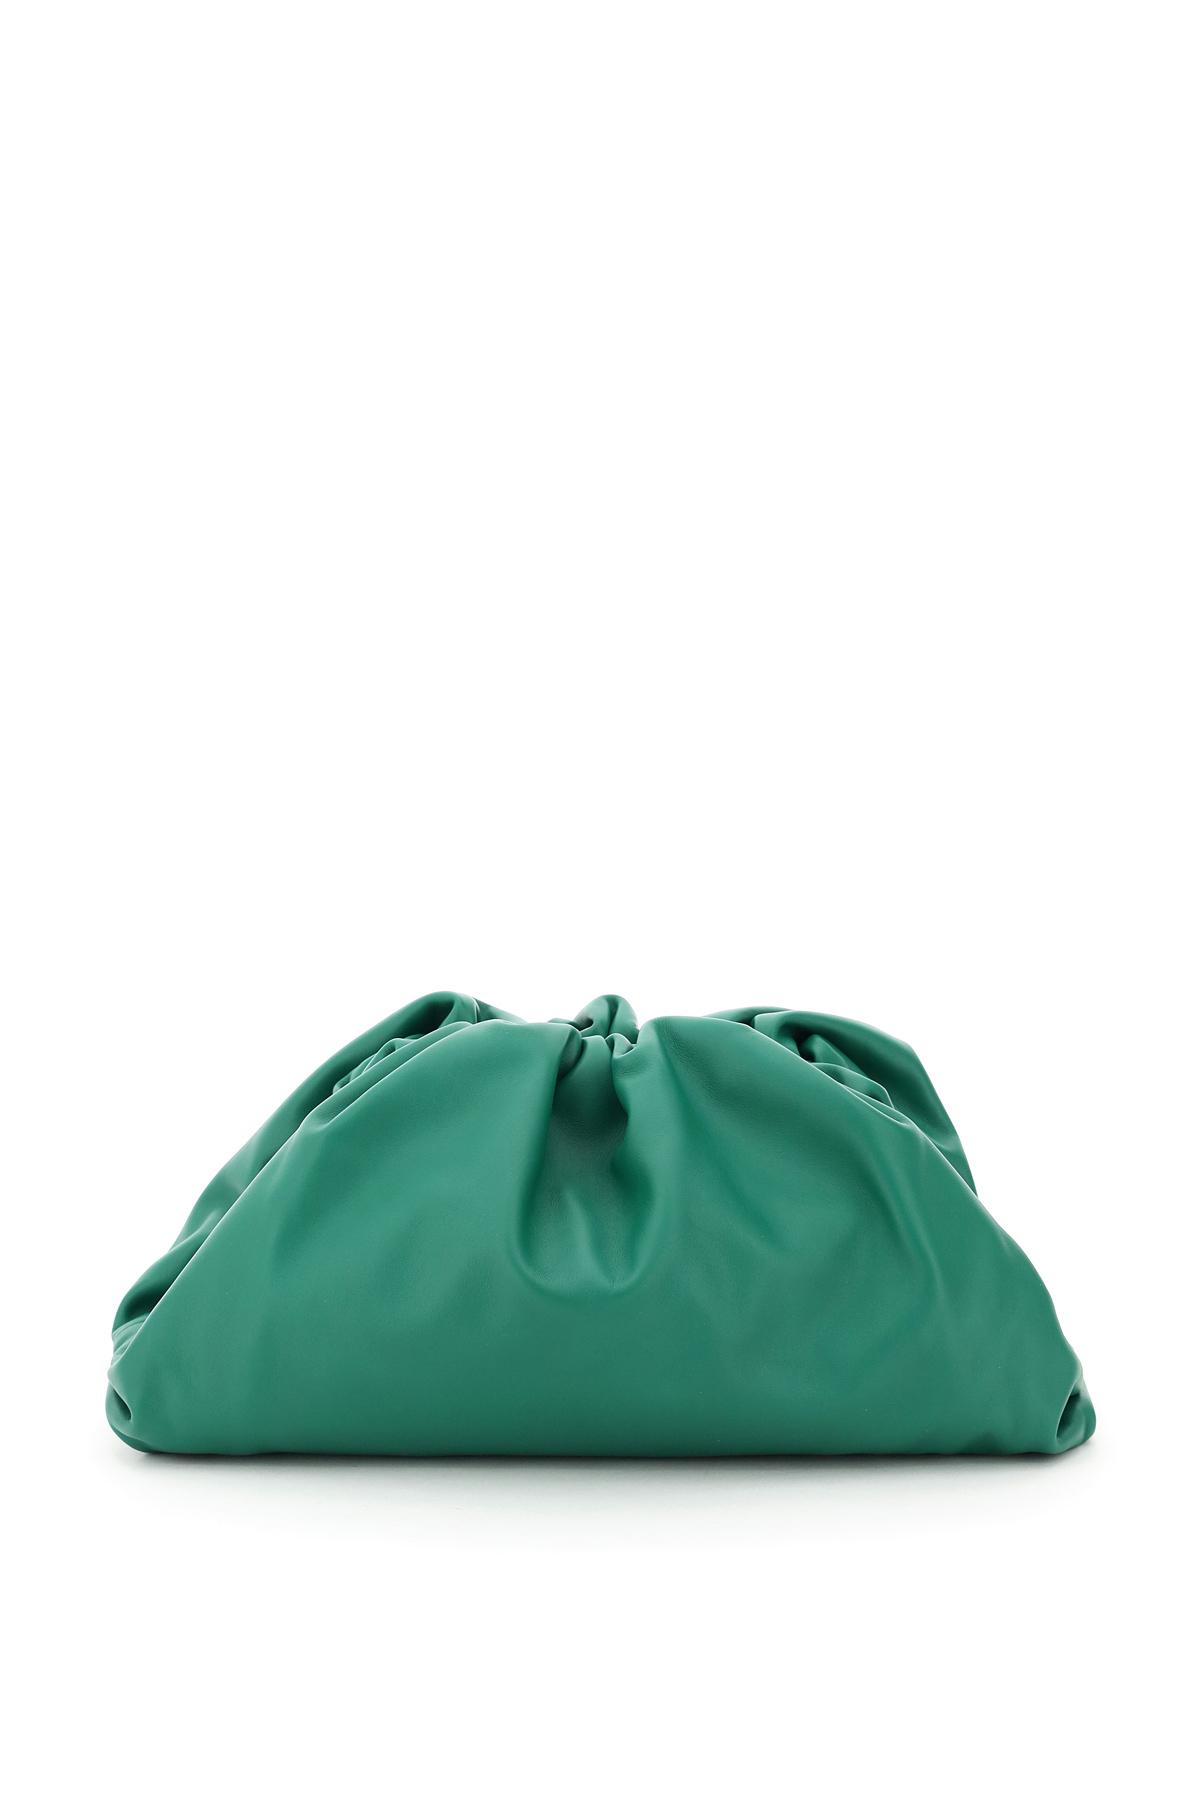 BOTTEGA VENETA THE POUCH LEATHER CLUTCH OS Green Leather